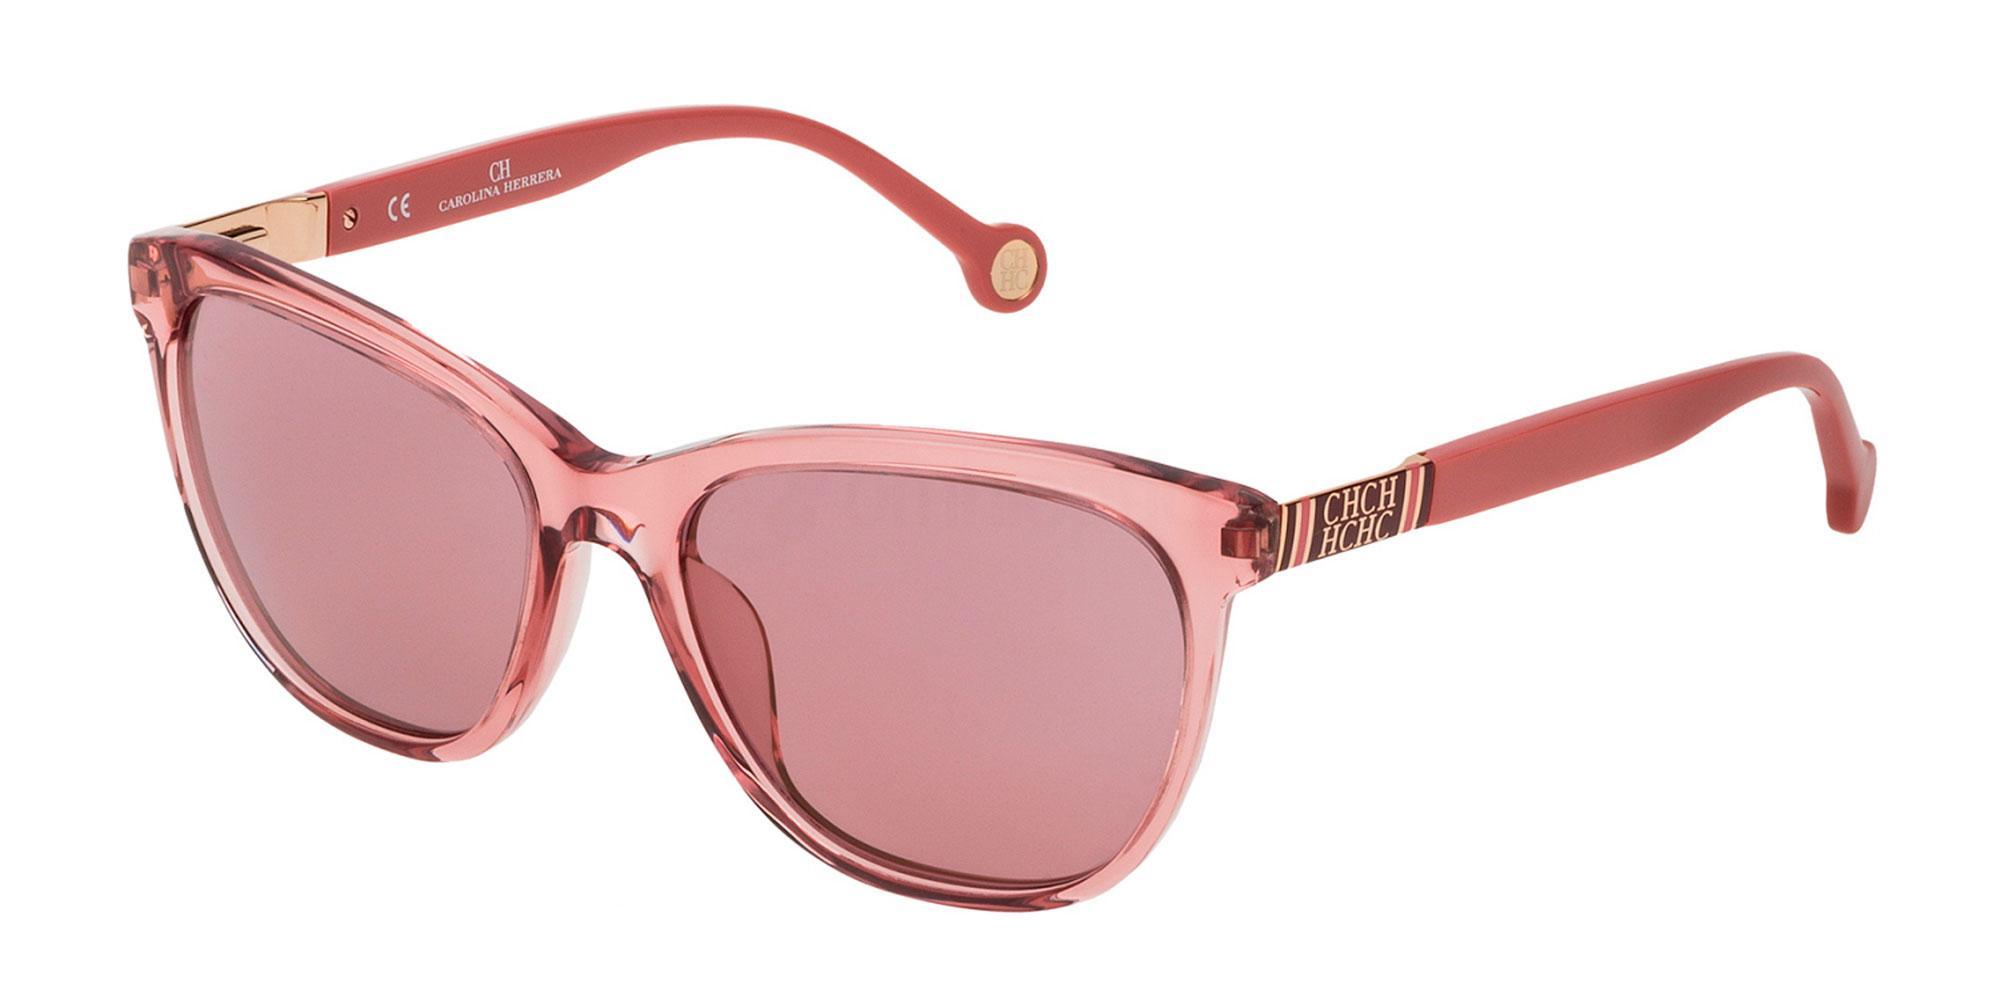 96DG SHE691 Sunglasses, CH Carolina Herrera